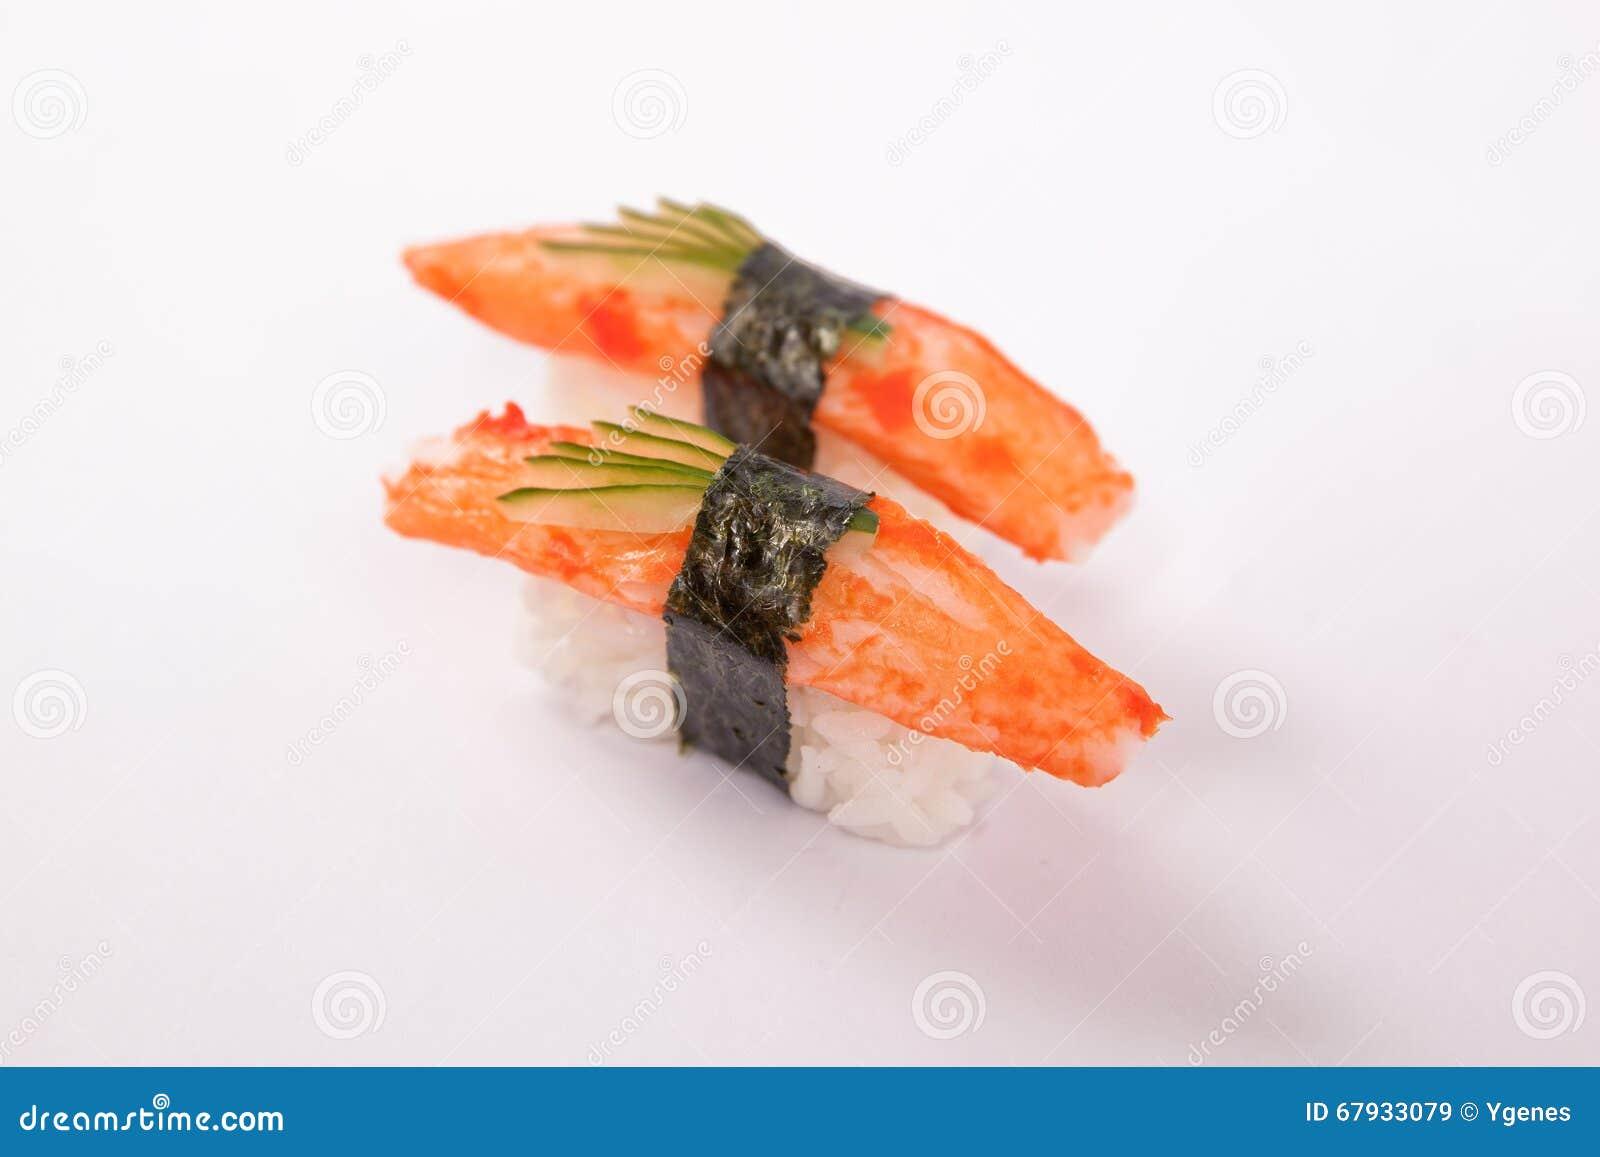 Pair of Crabstick Sushi